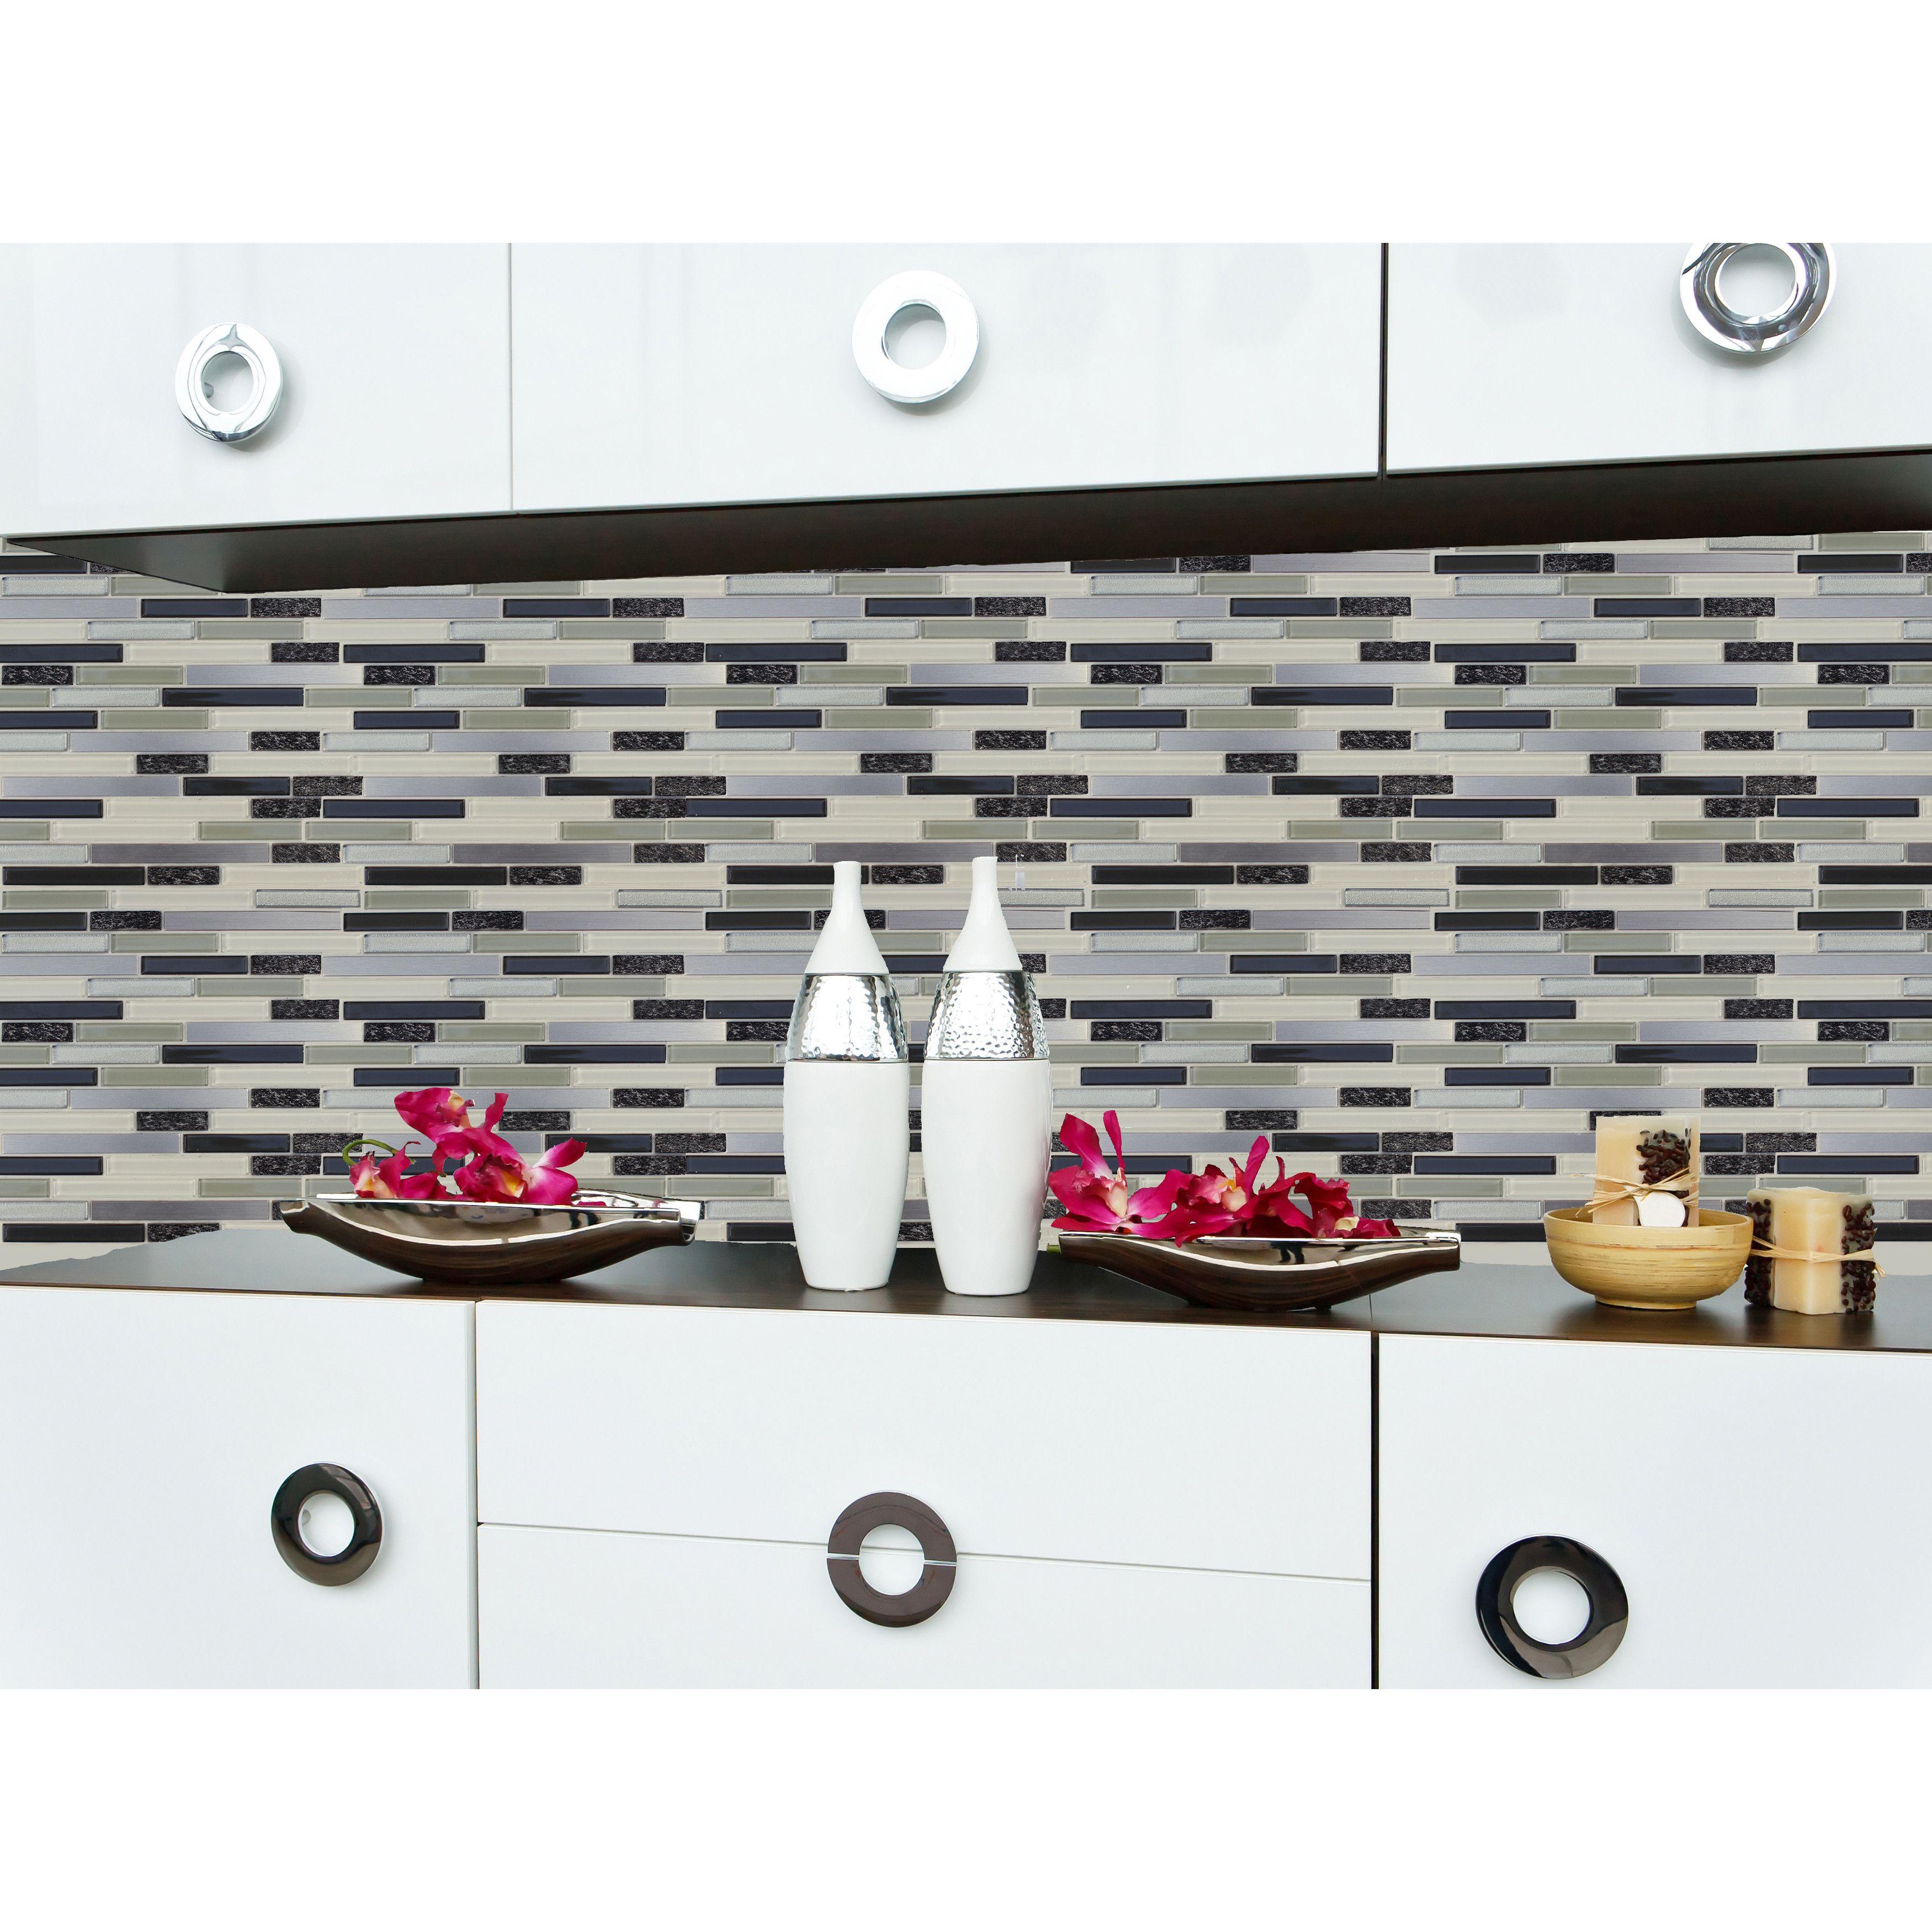 Instant Mosaic Random Sized Peel u Stick Mosaic Tile in Gray White